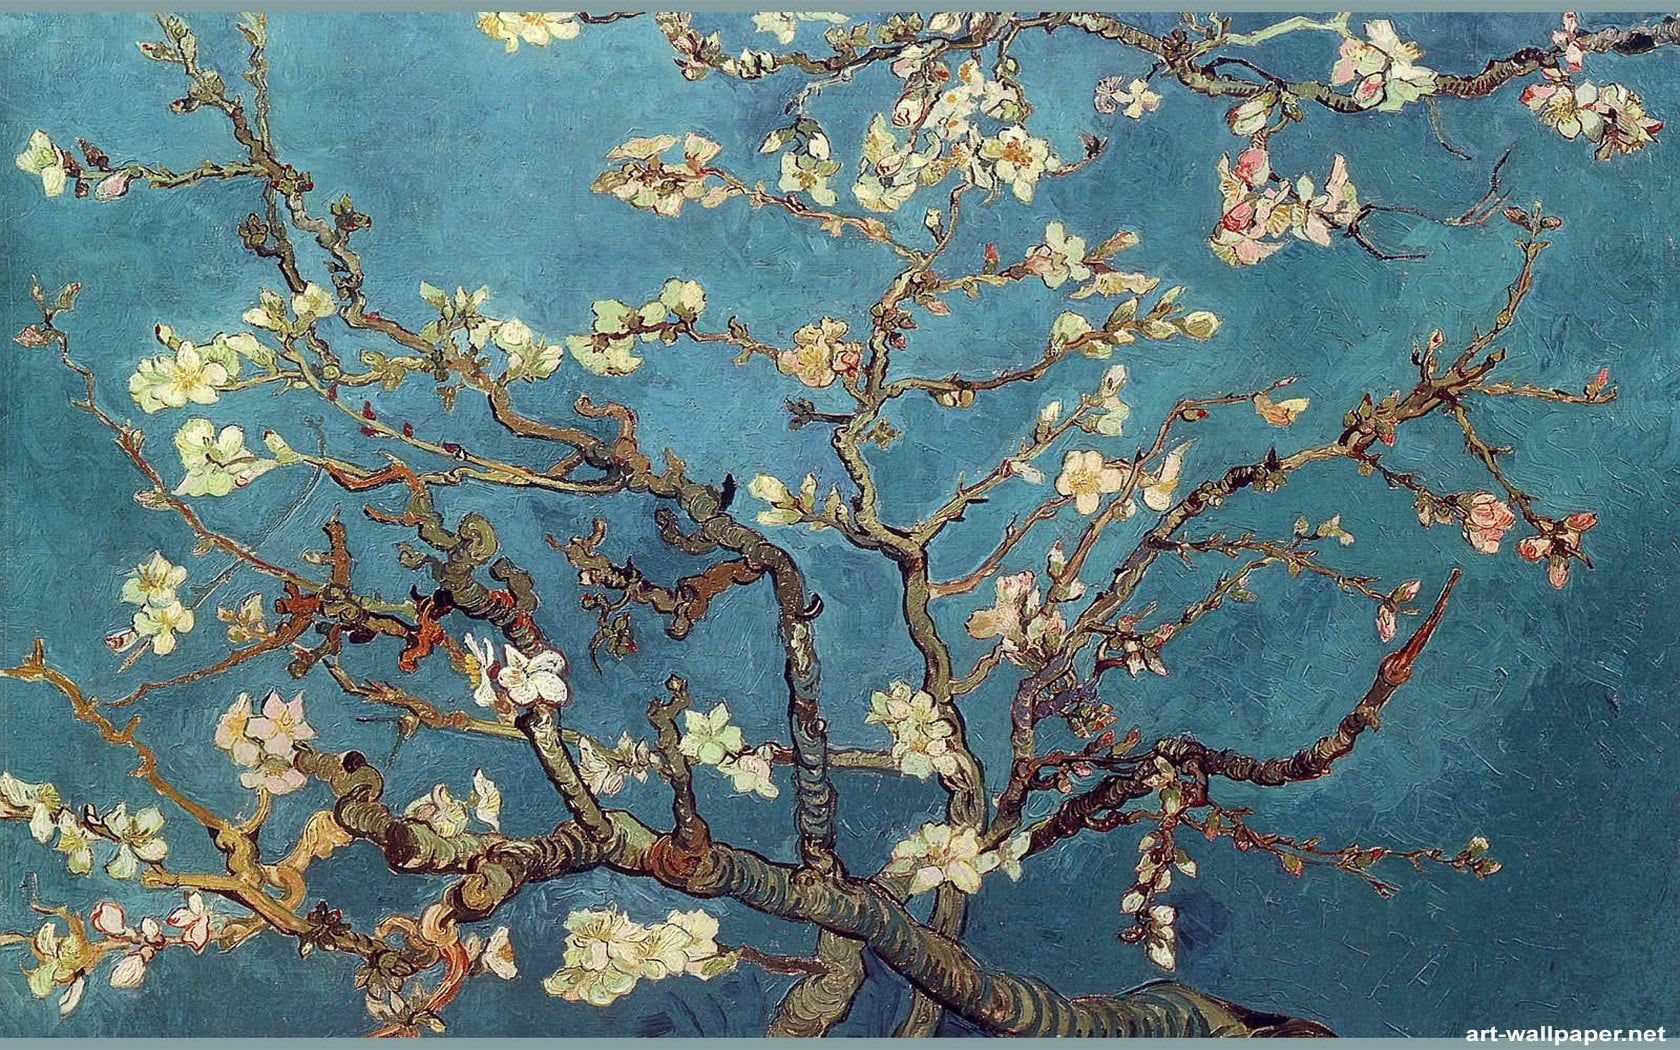 Vincent Van Gogh Classic Art Painting Flowers Trees Artwork 720p Wallpaper Hdwallpaper Desktop Oil Painting Abstract Canvas Art Van Gogh Paintings